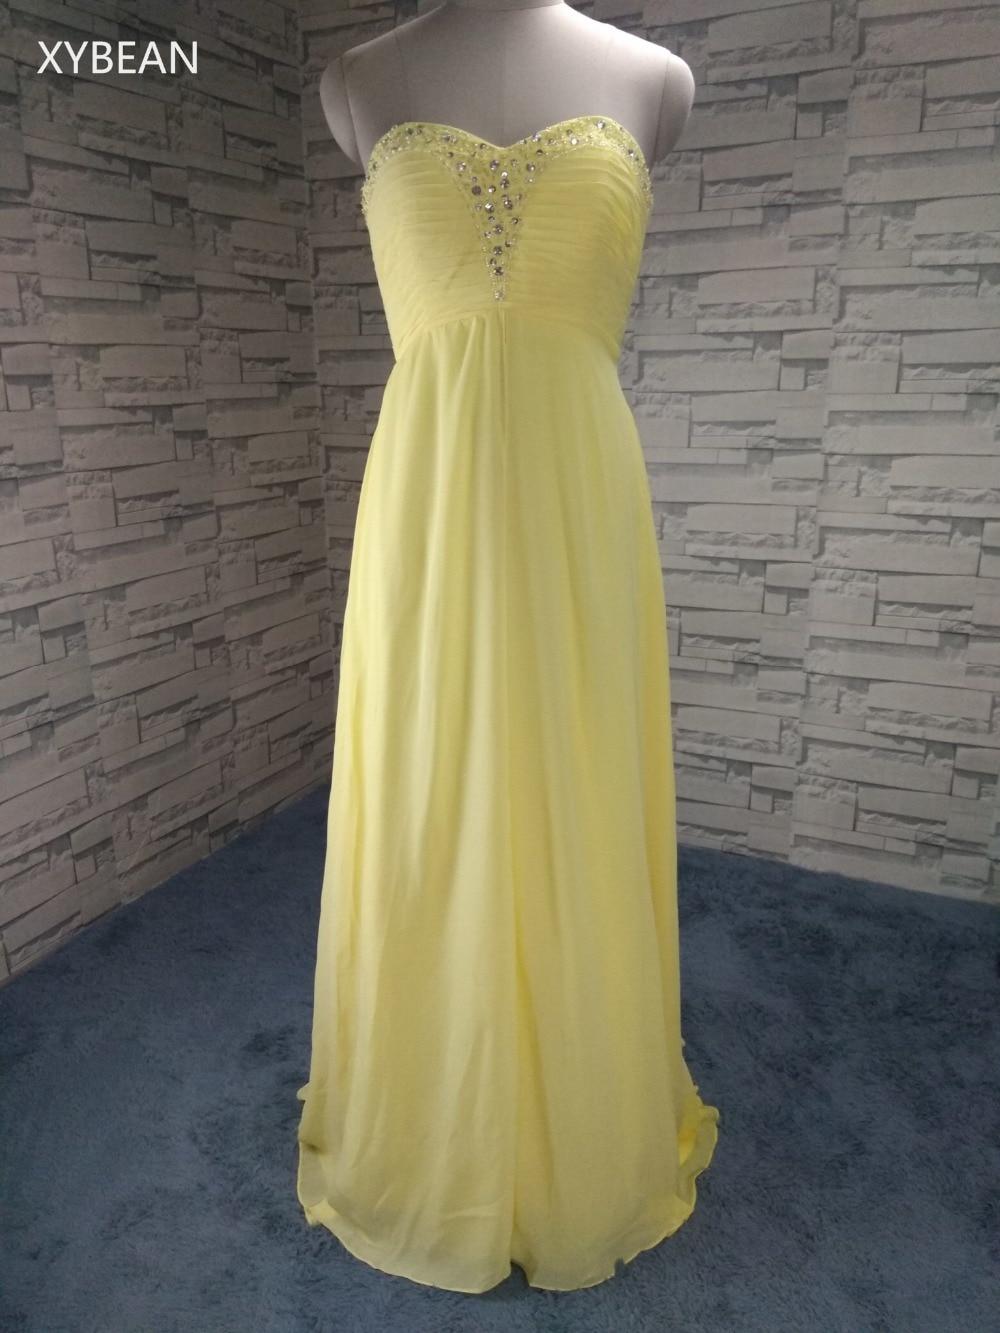 Cheap Price ! Sweetheart Beading Floor Lenght Chiffon Evening Dresses(China)